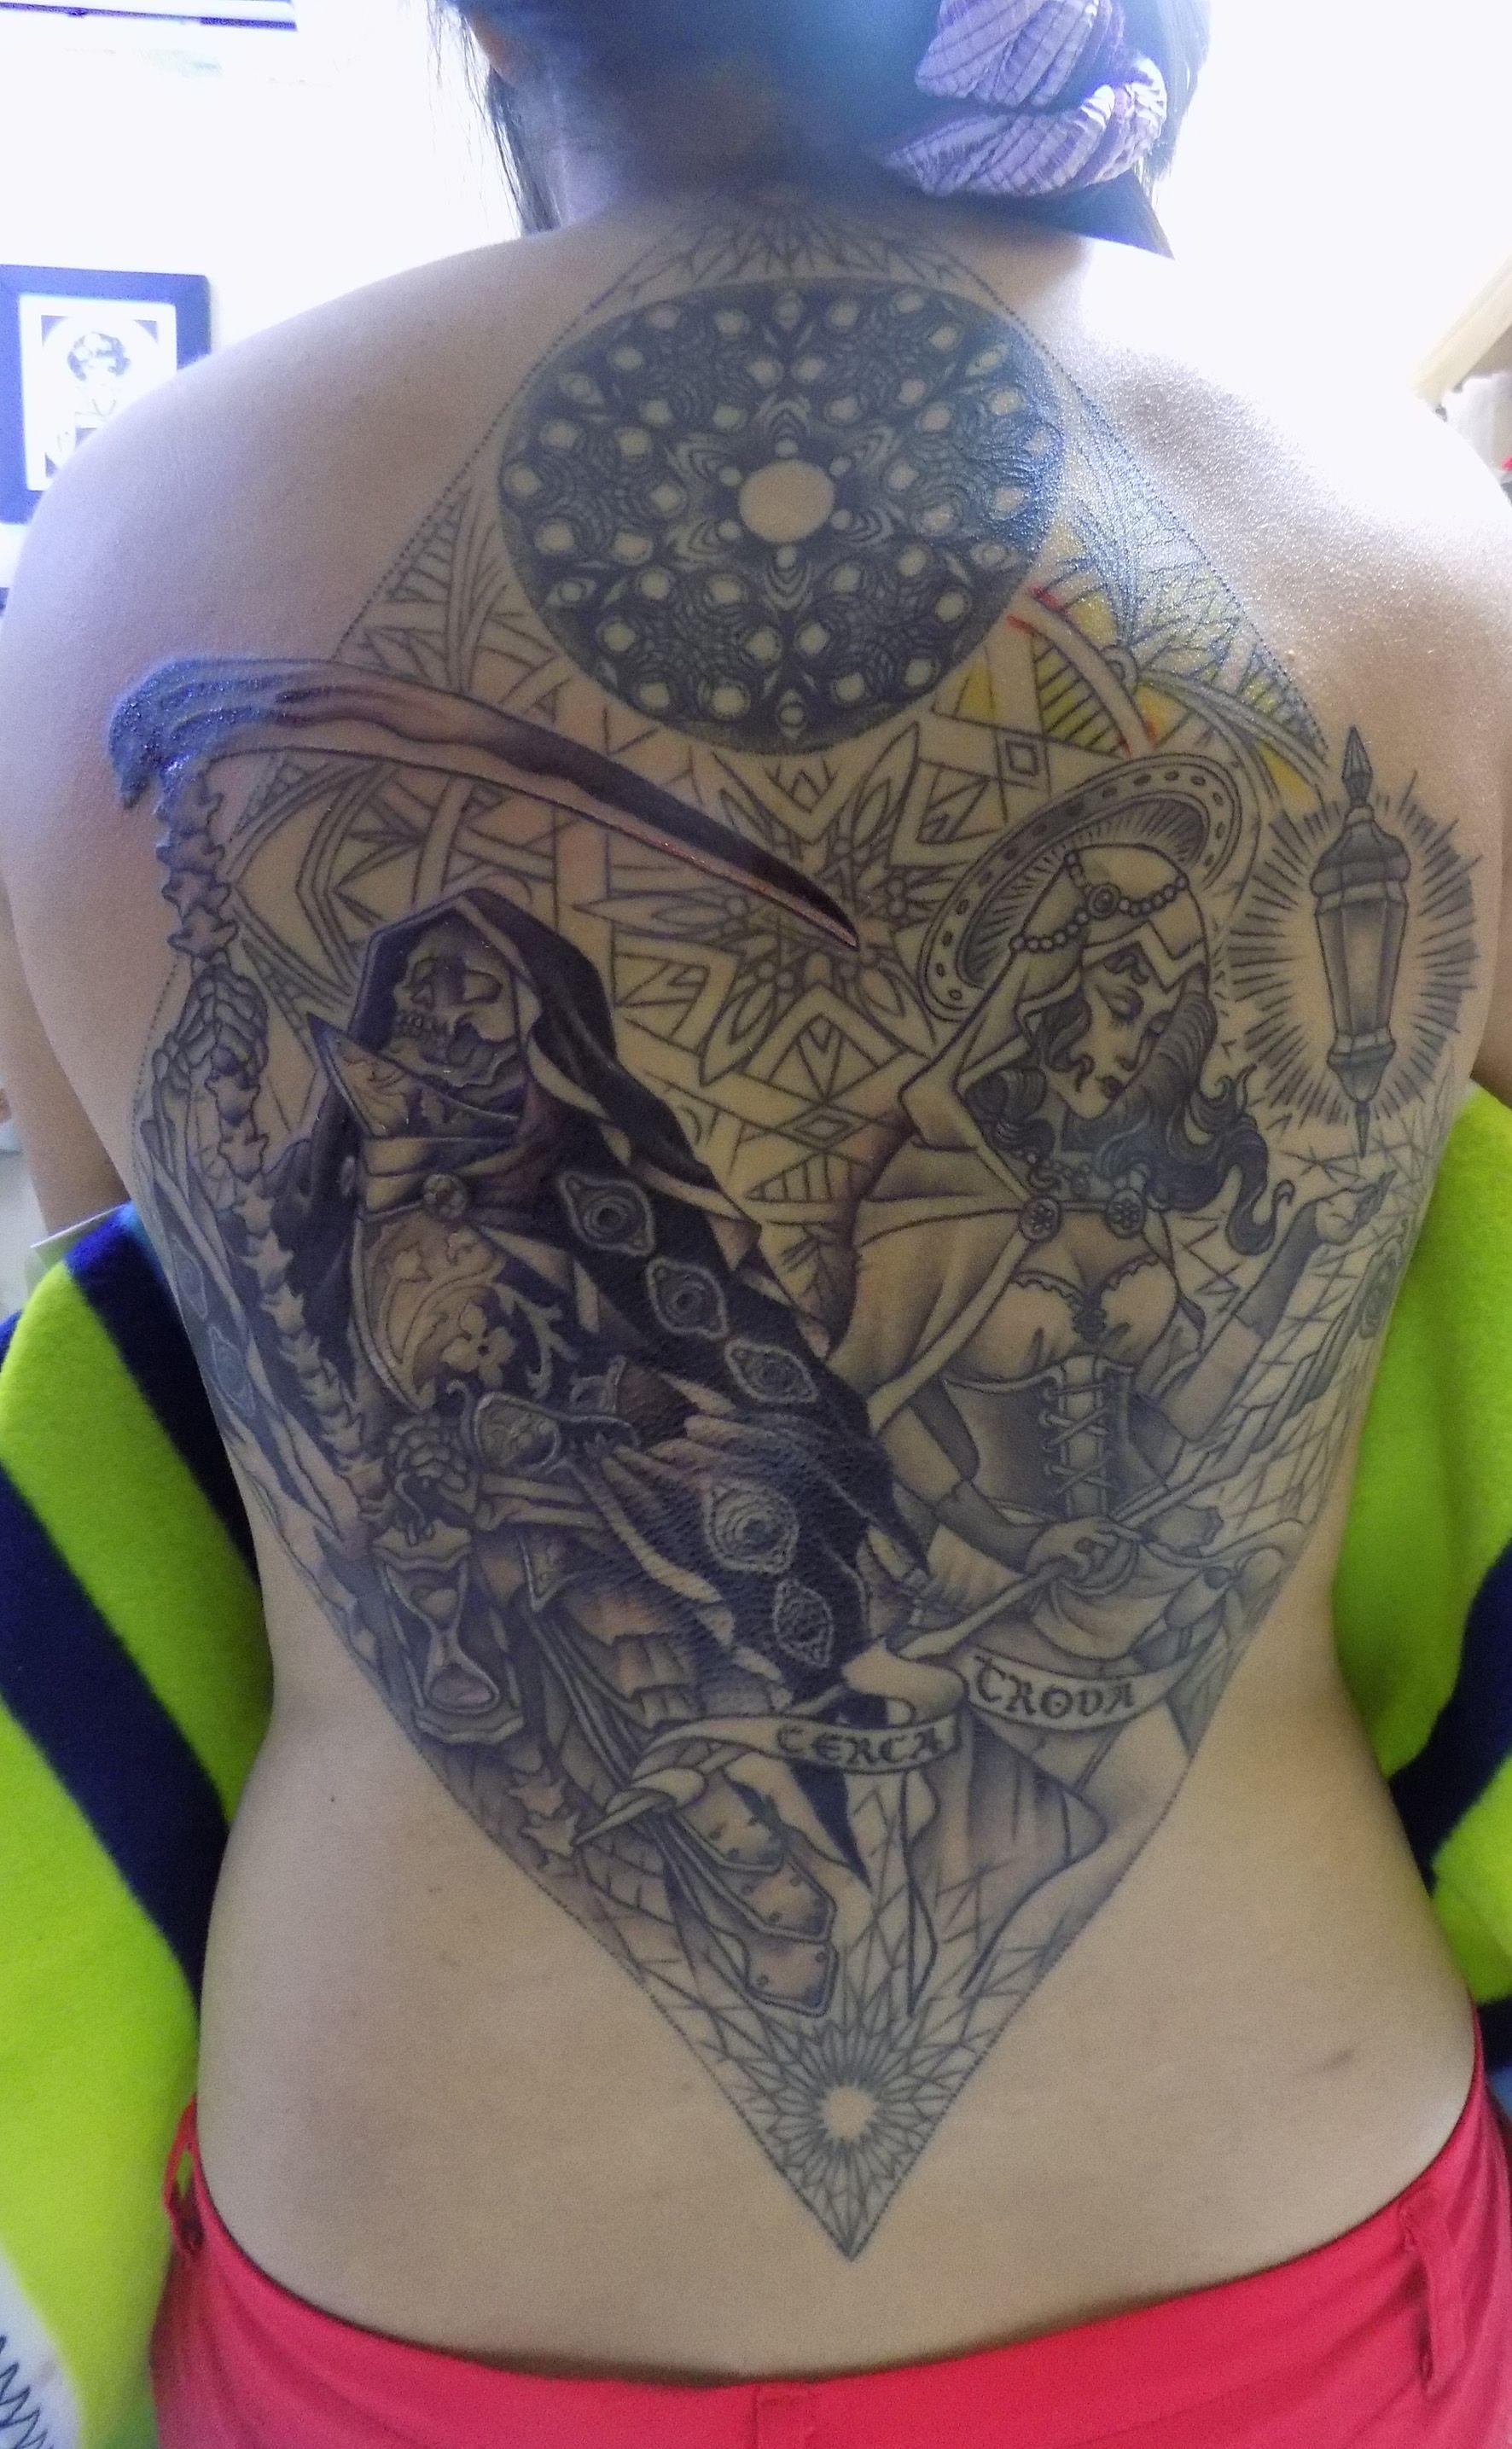 Still One More Session To Go Tattoo Artist Mulie Addlecoat Thinking Tree Tattoo Jakarta Indonesia